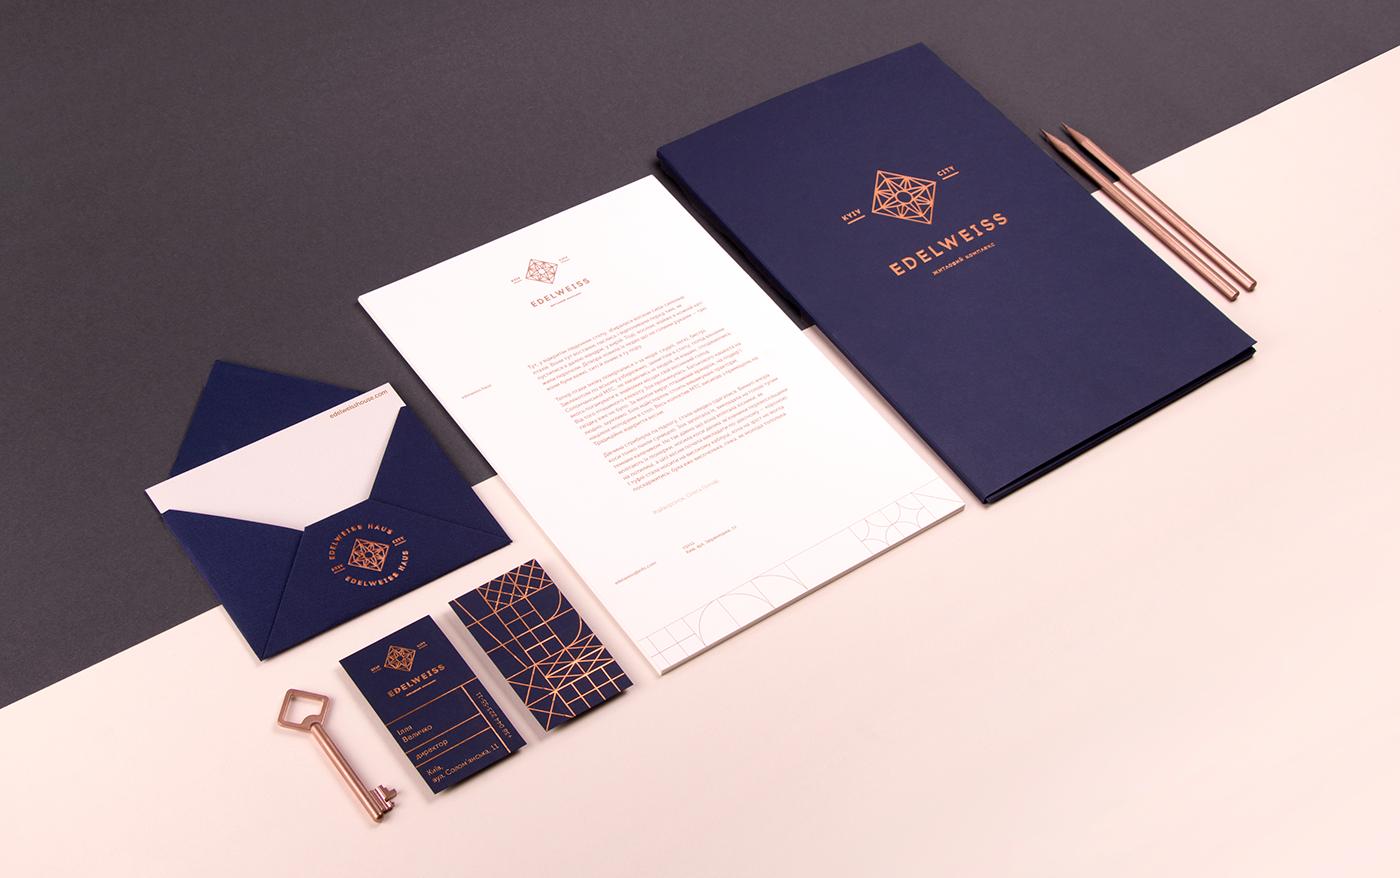 Edelweiss House雪絨之家品牌視覺VIS設計欣賞-深圳VI設計2